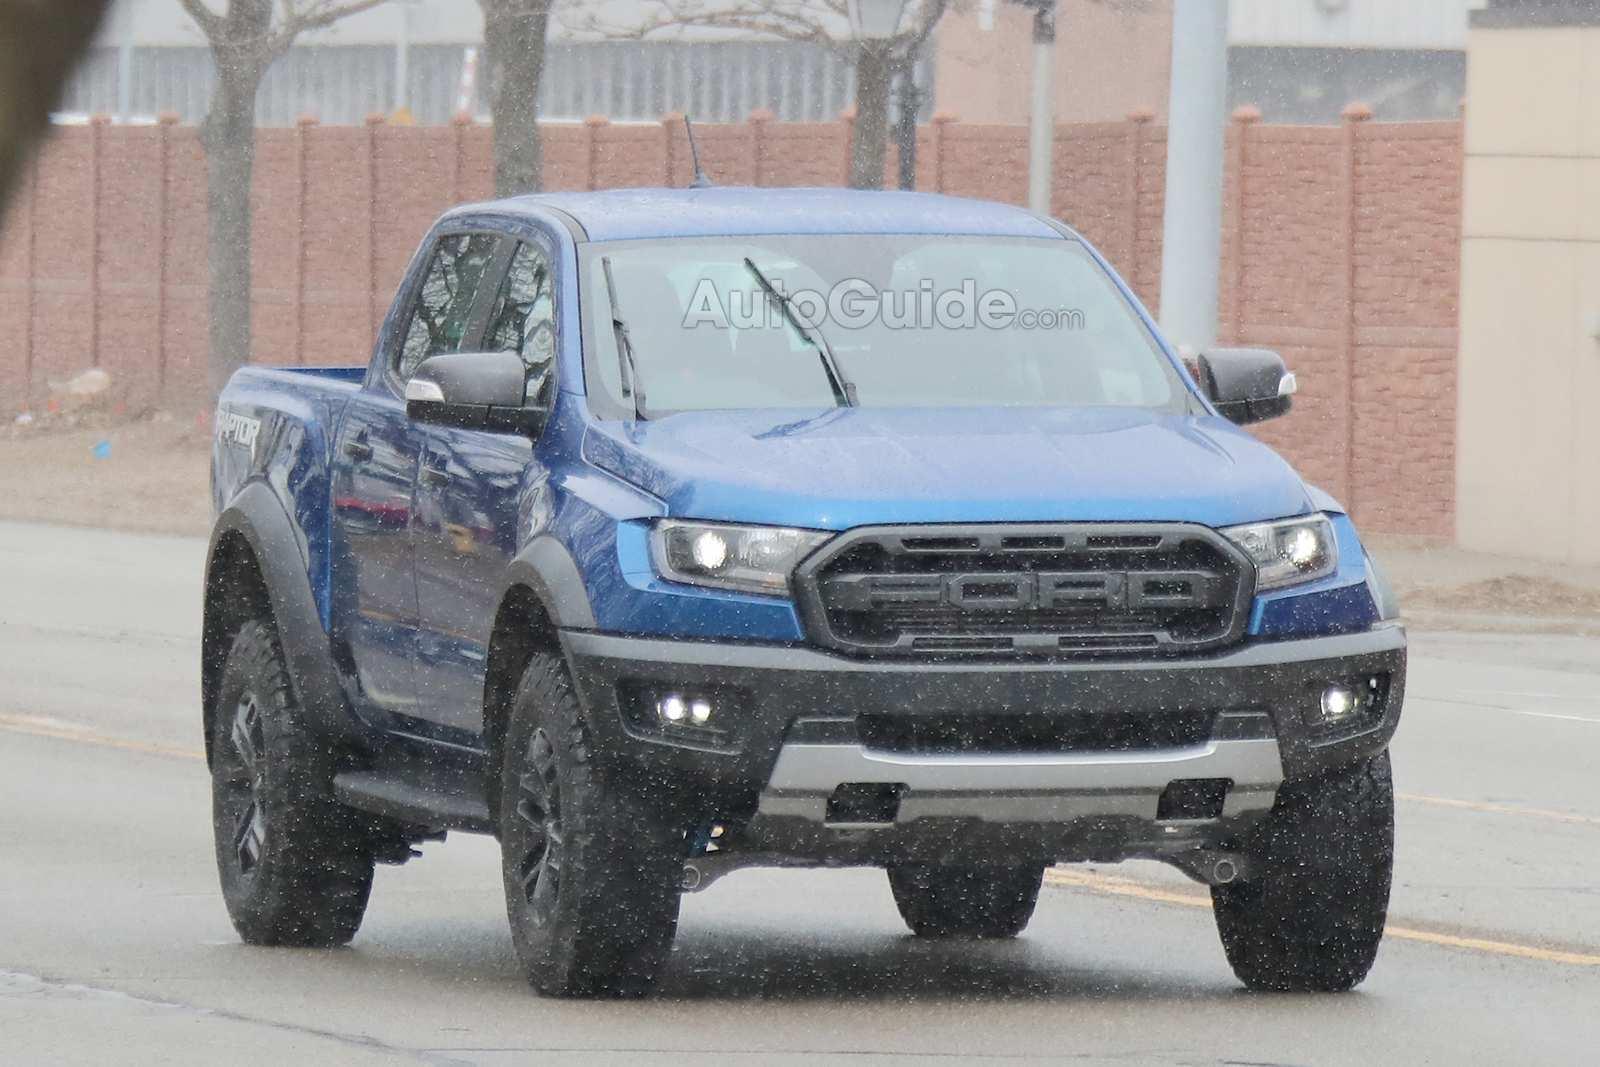 21 Great 2019 Ford Ranger Raptor Spy Shoot with 2019 Ford Ranger Raptor